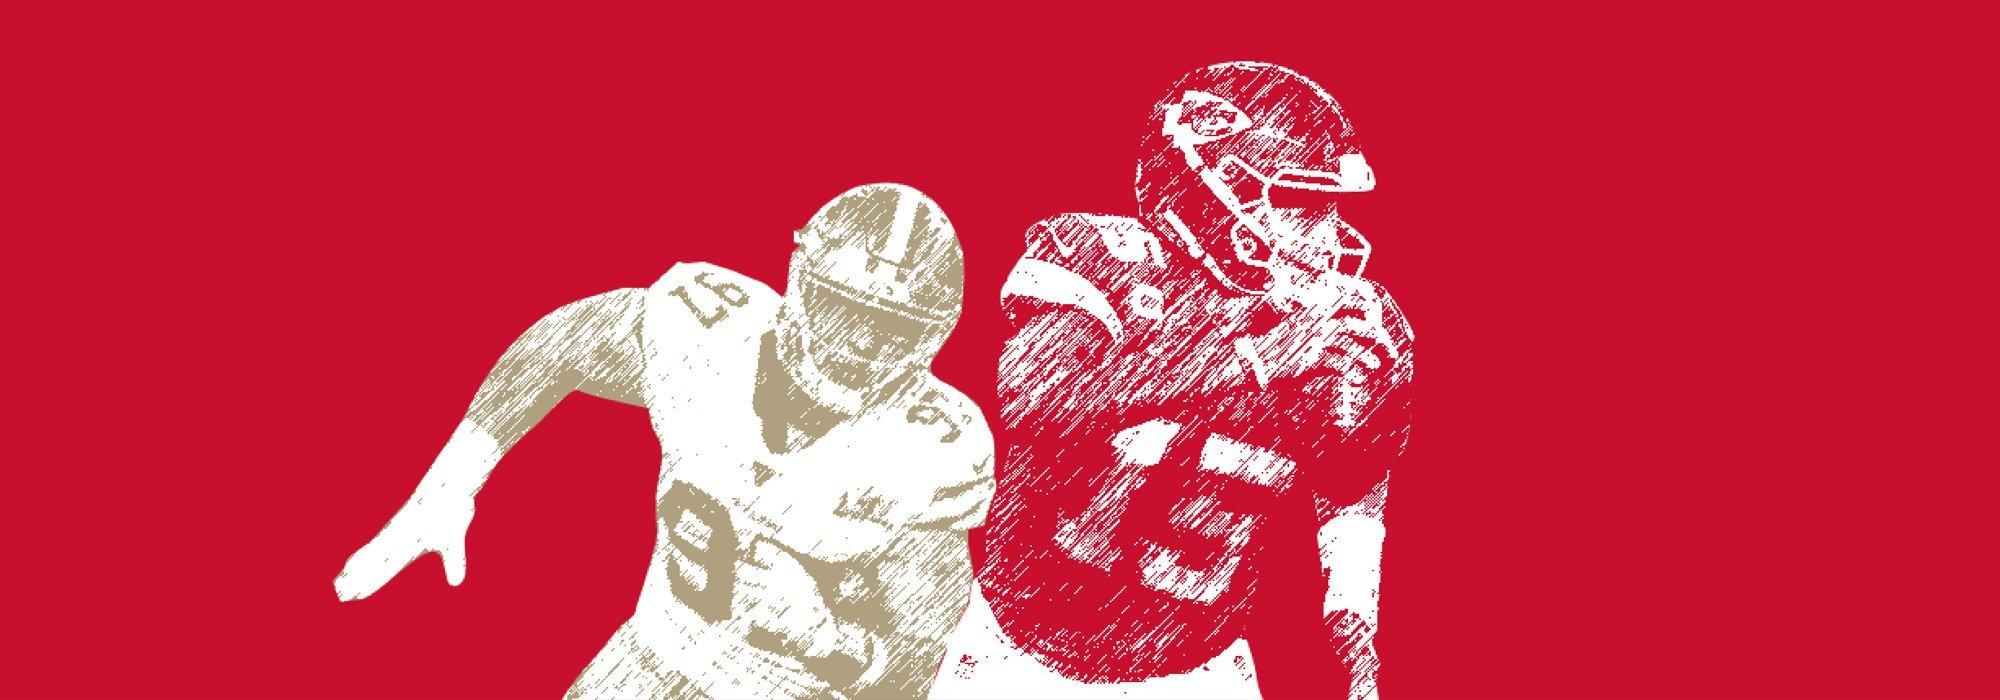 Color Rosso, protagonista indiscusso del Super Bowl 2020